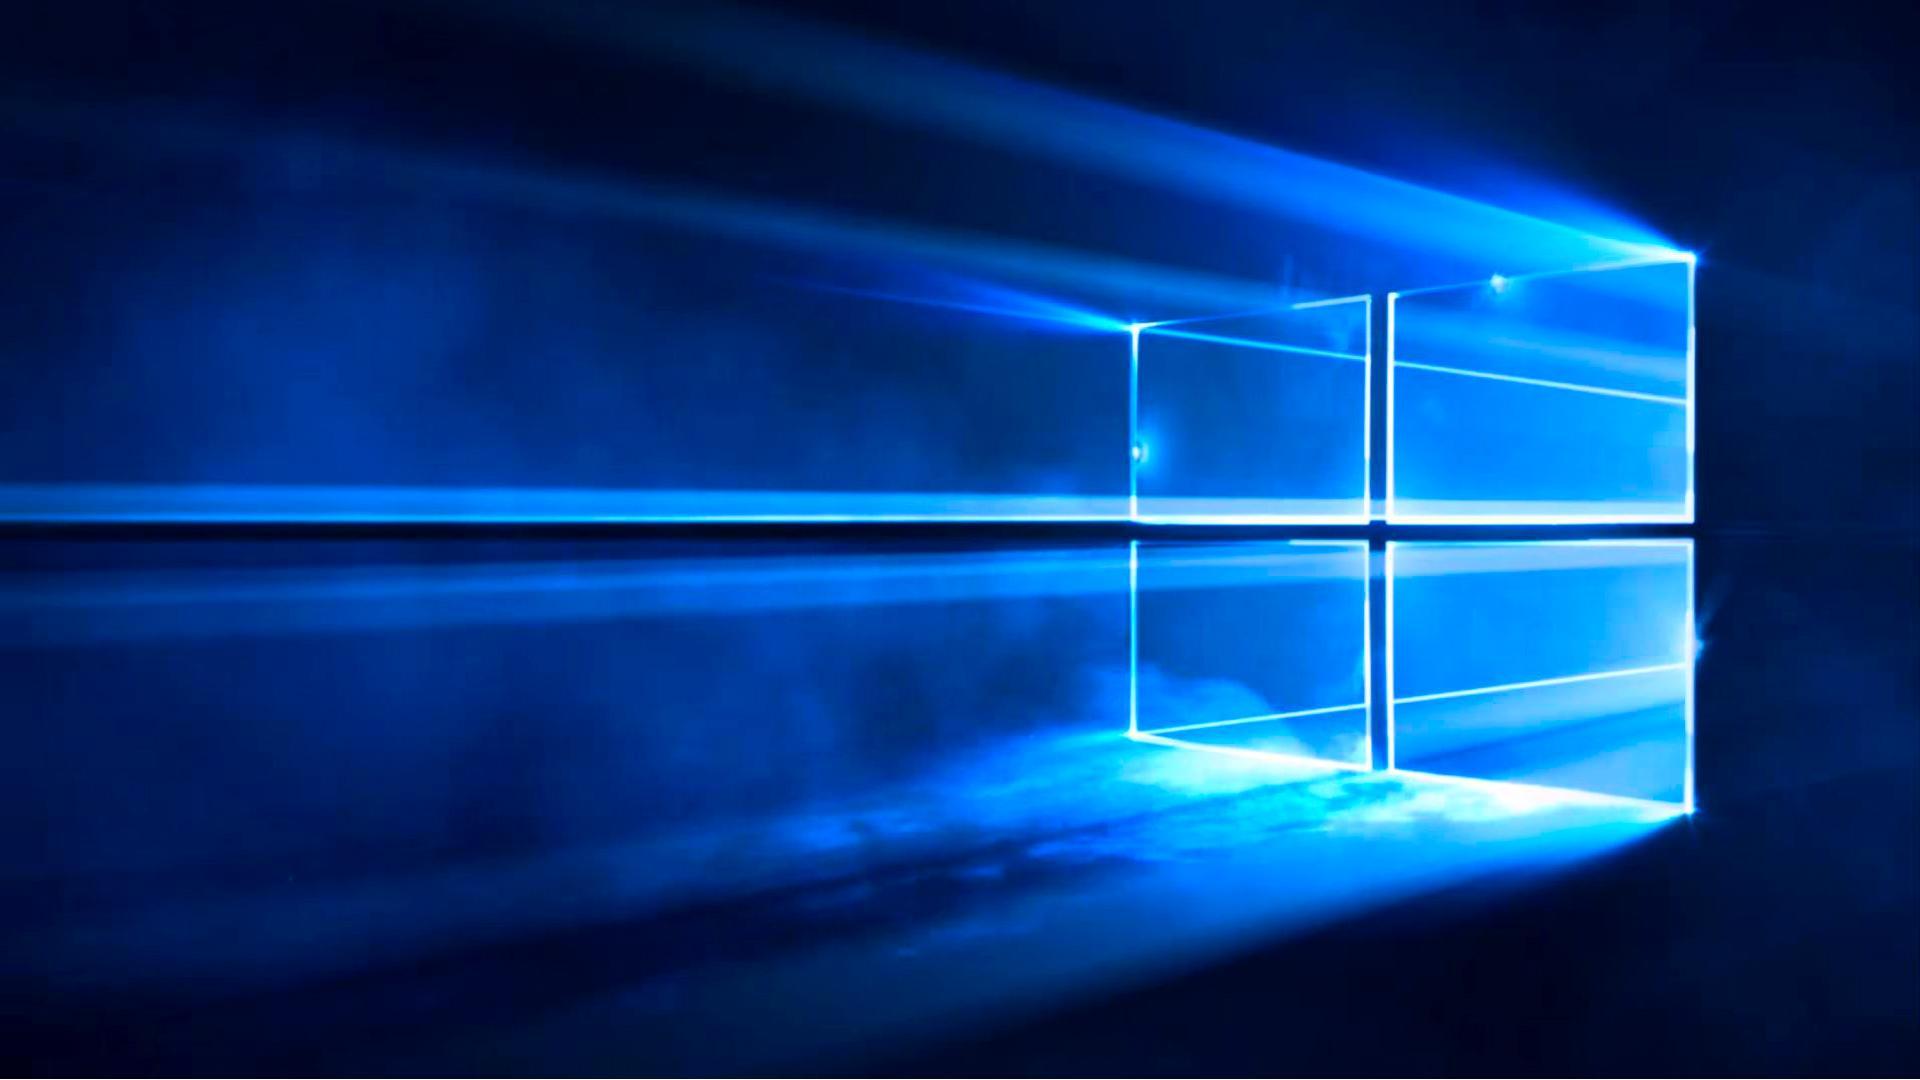 Windows 10 Hd Desktop Full Screen Wallpapers Wallpaper Cave